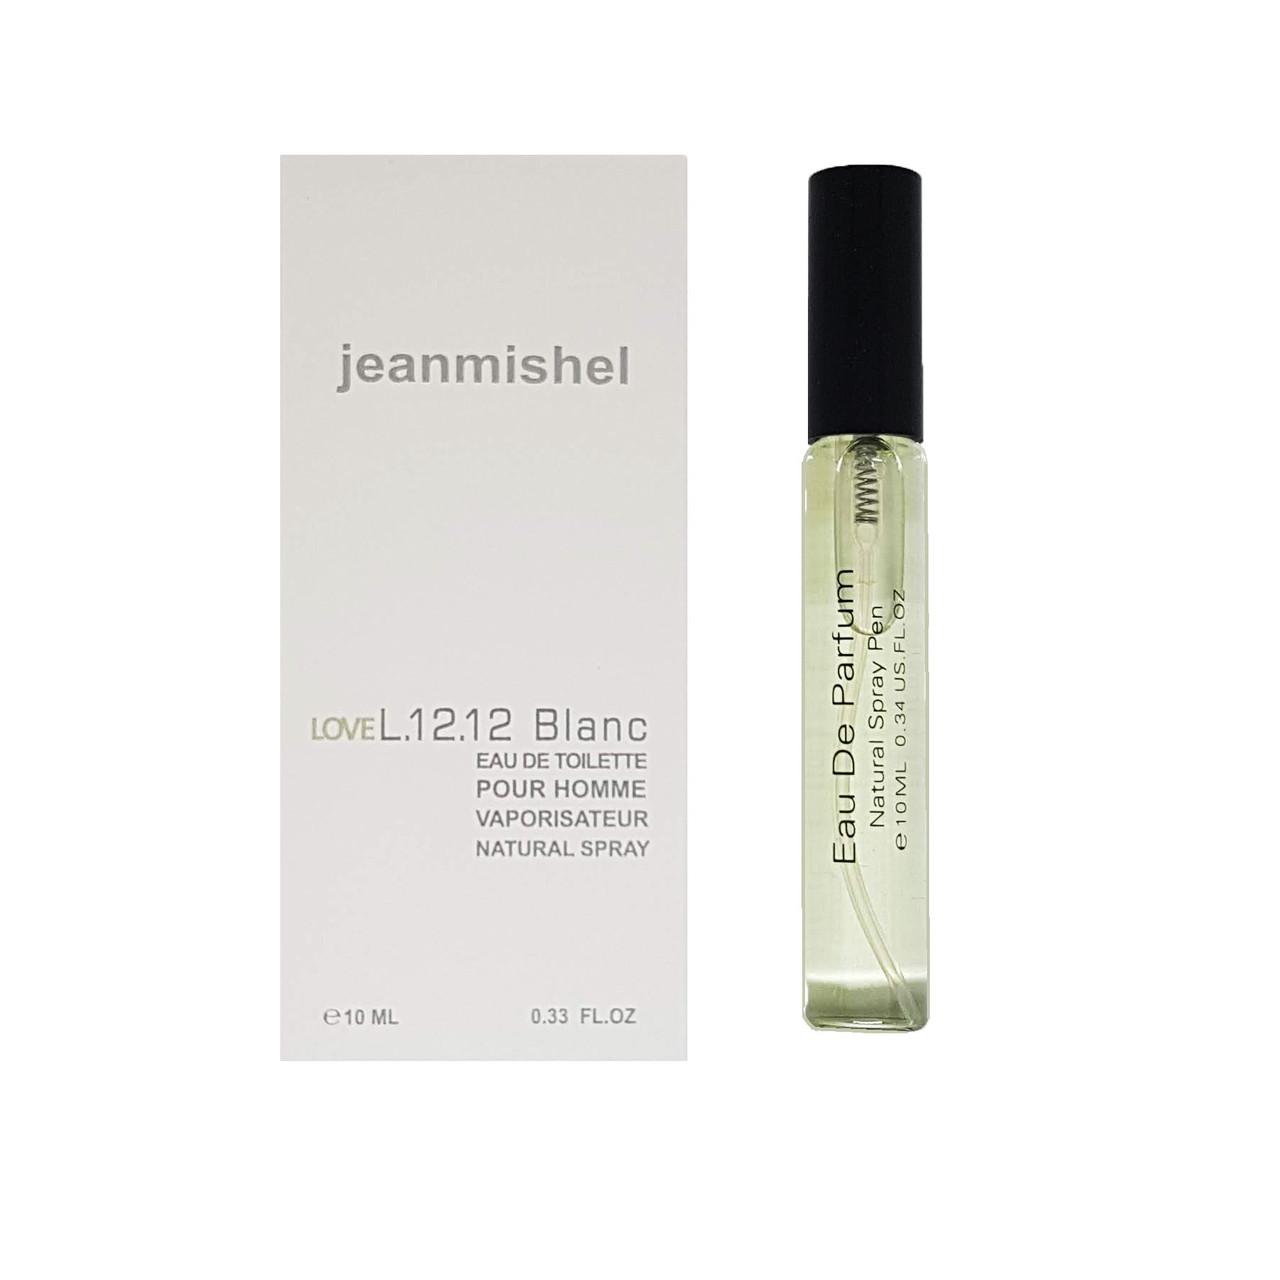 Jeanmishel Love L.12.12 Blanc (87) 10ml